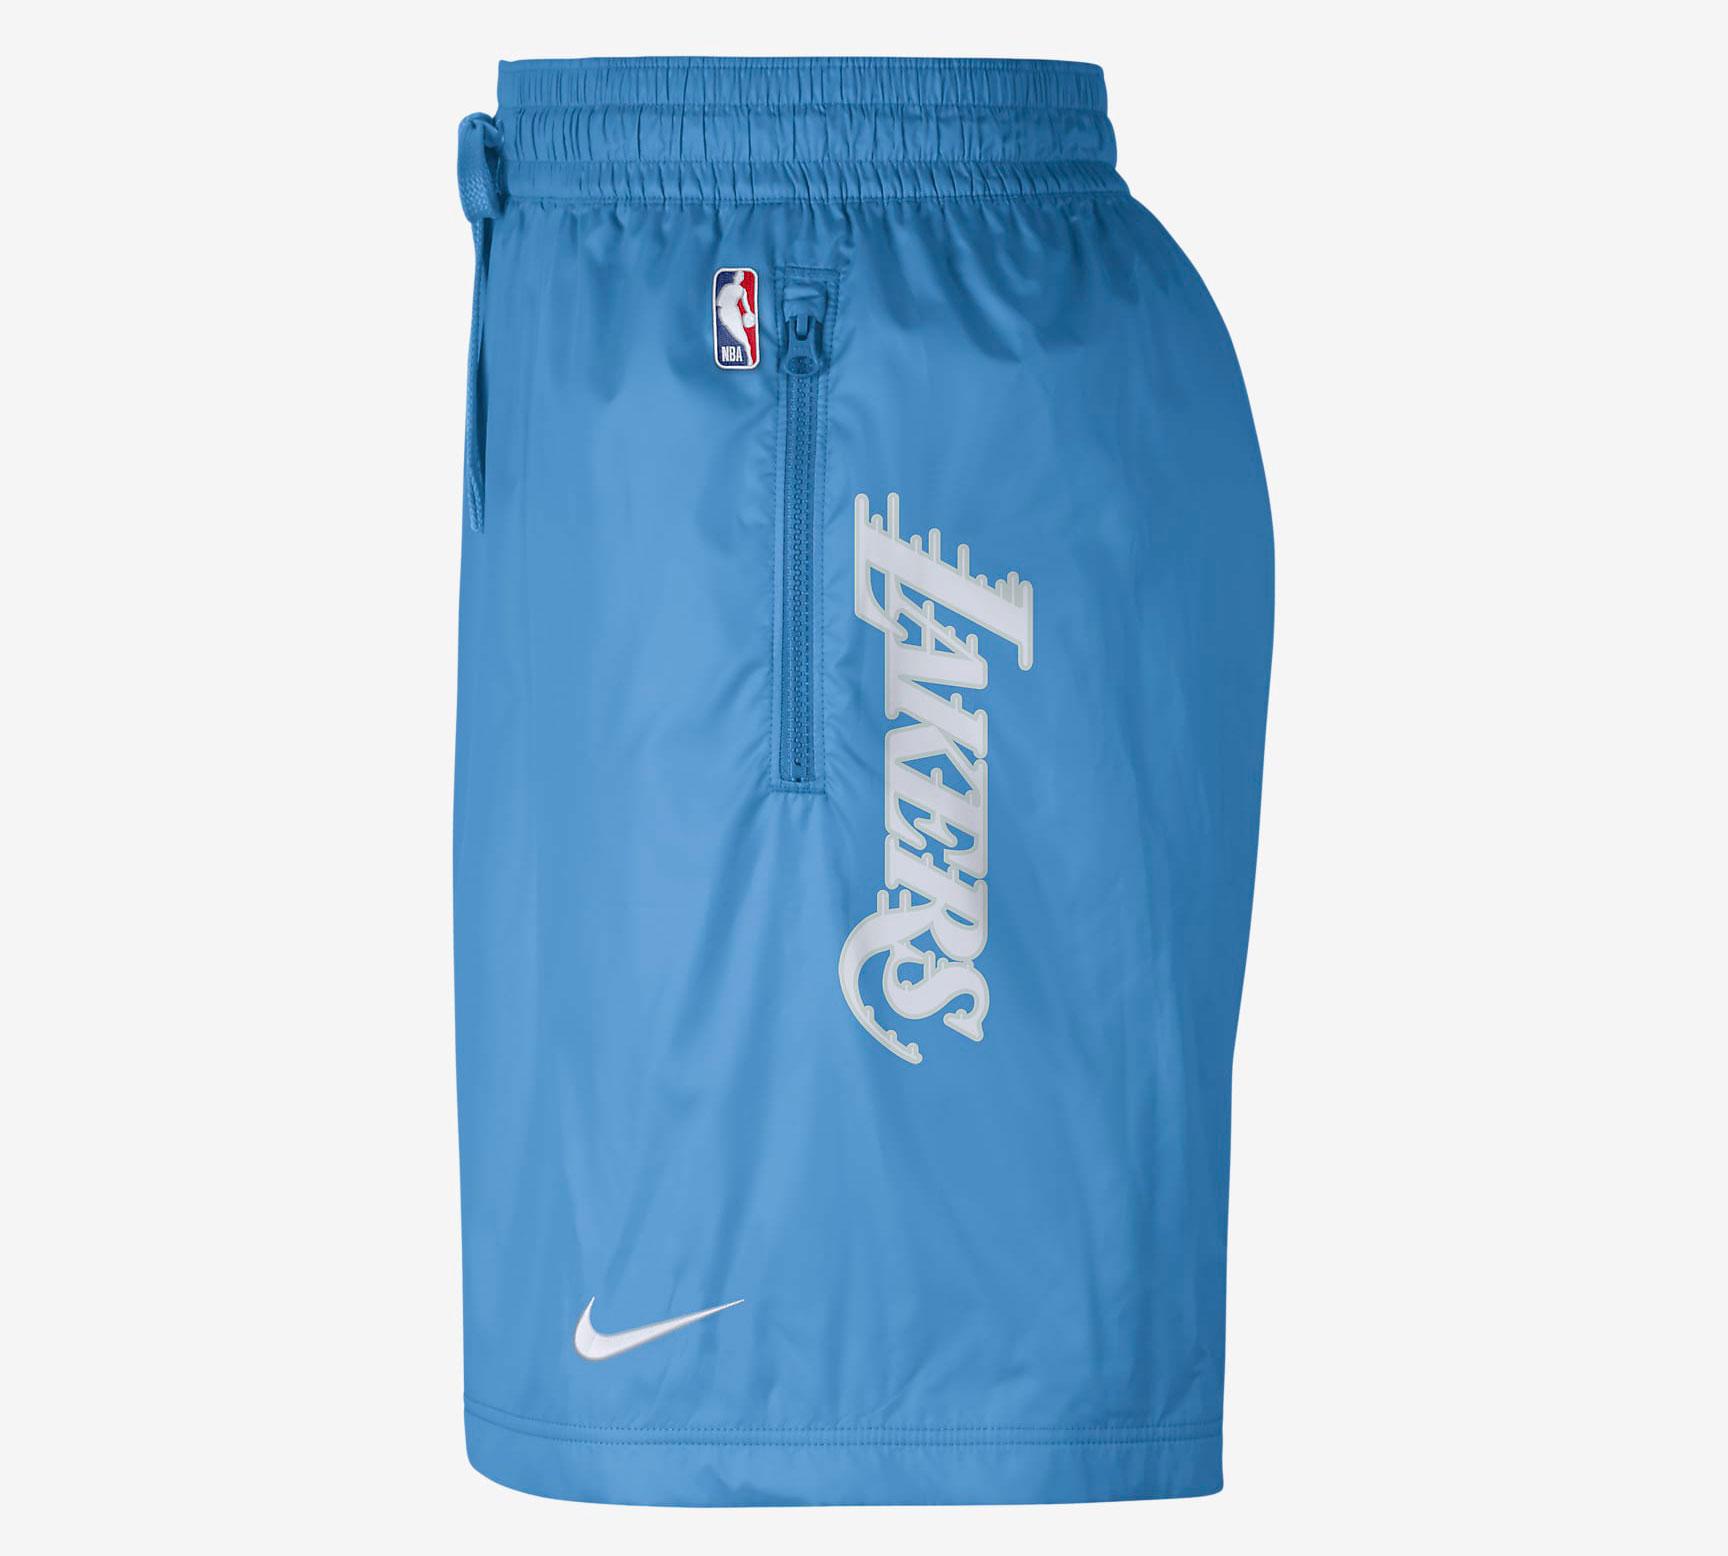 nike-lakers-city-edition-2020-21-blue-shorts-2